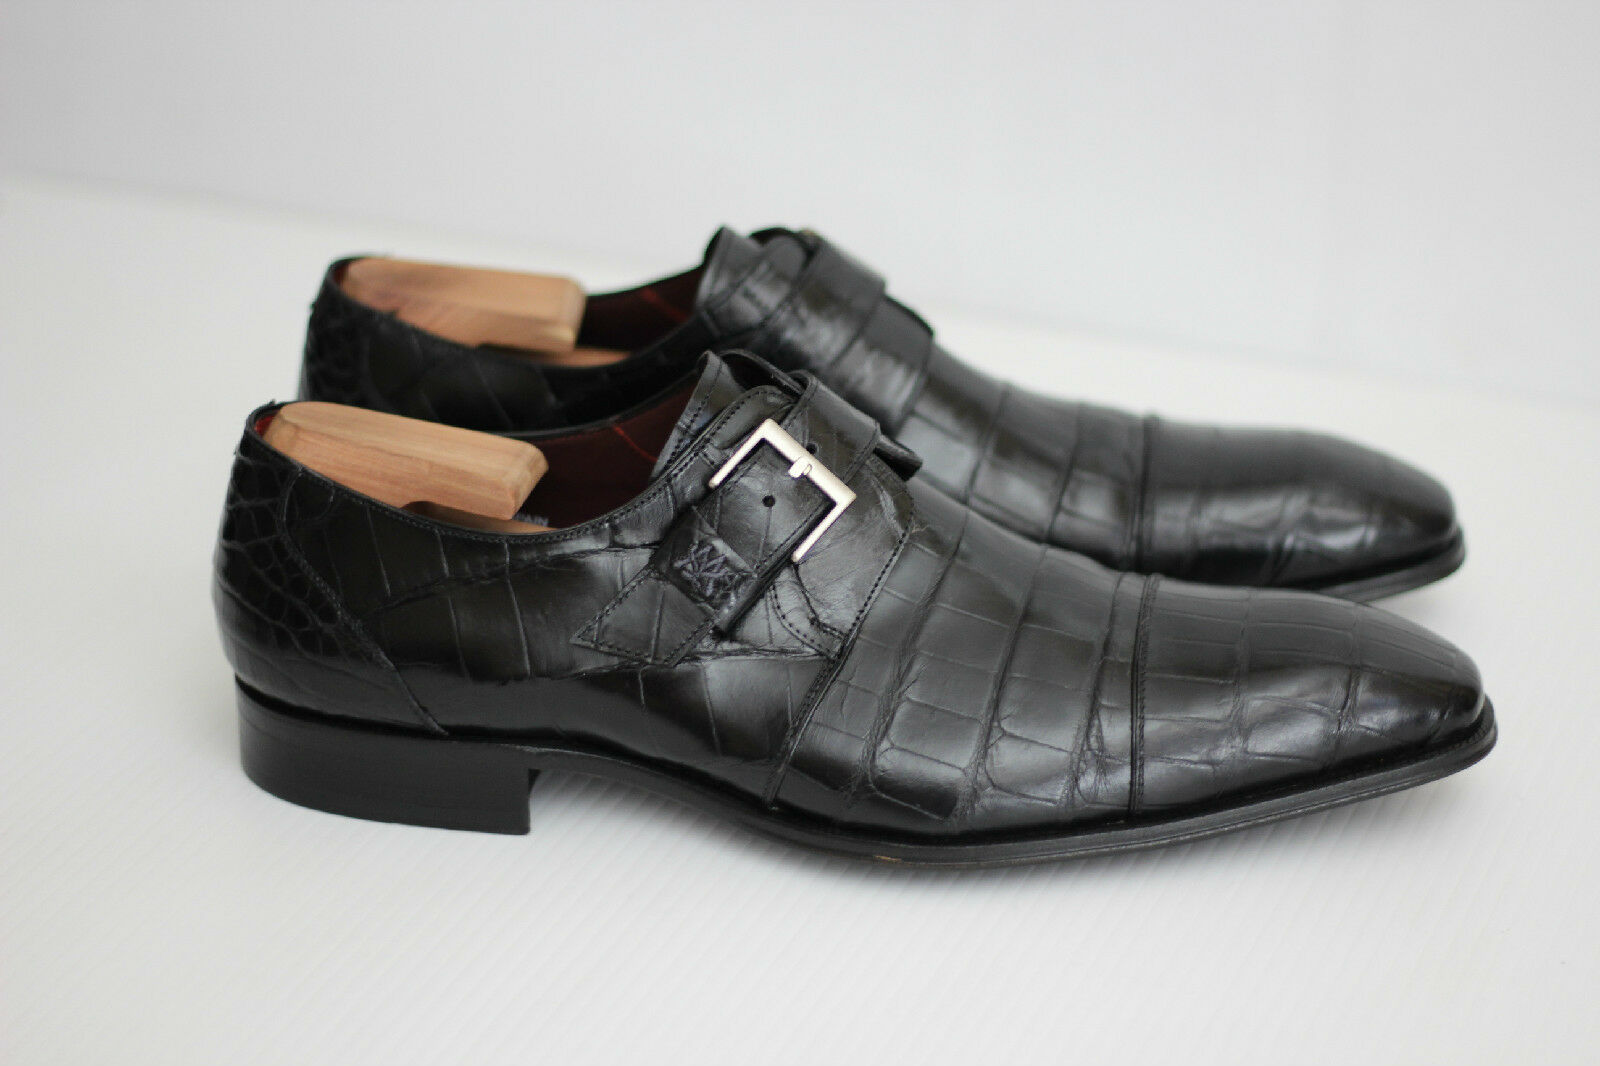 Mezlan 'Berlin' Genuine Alligator Monk Strap scarpe - nero - 12 M - 79699 (S90)